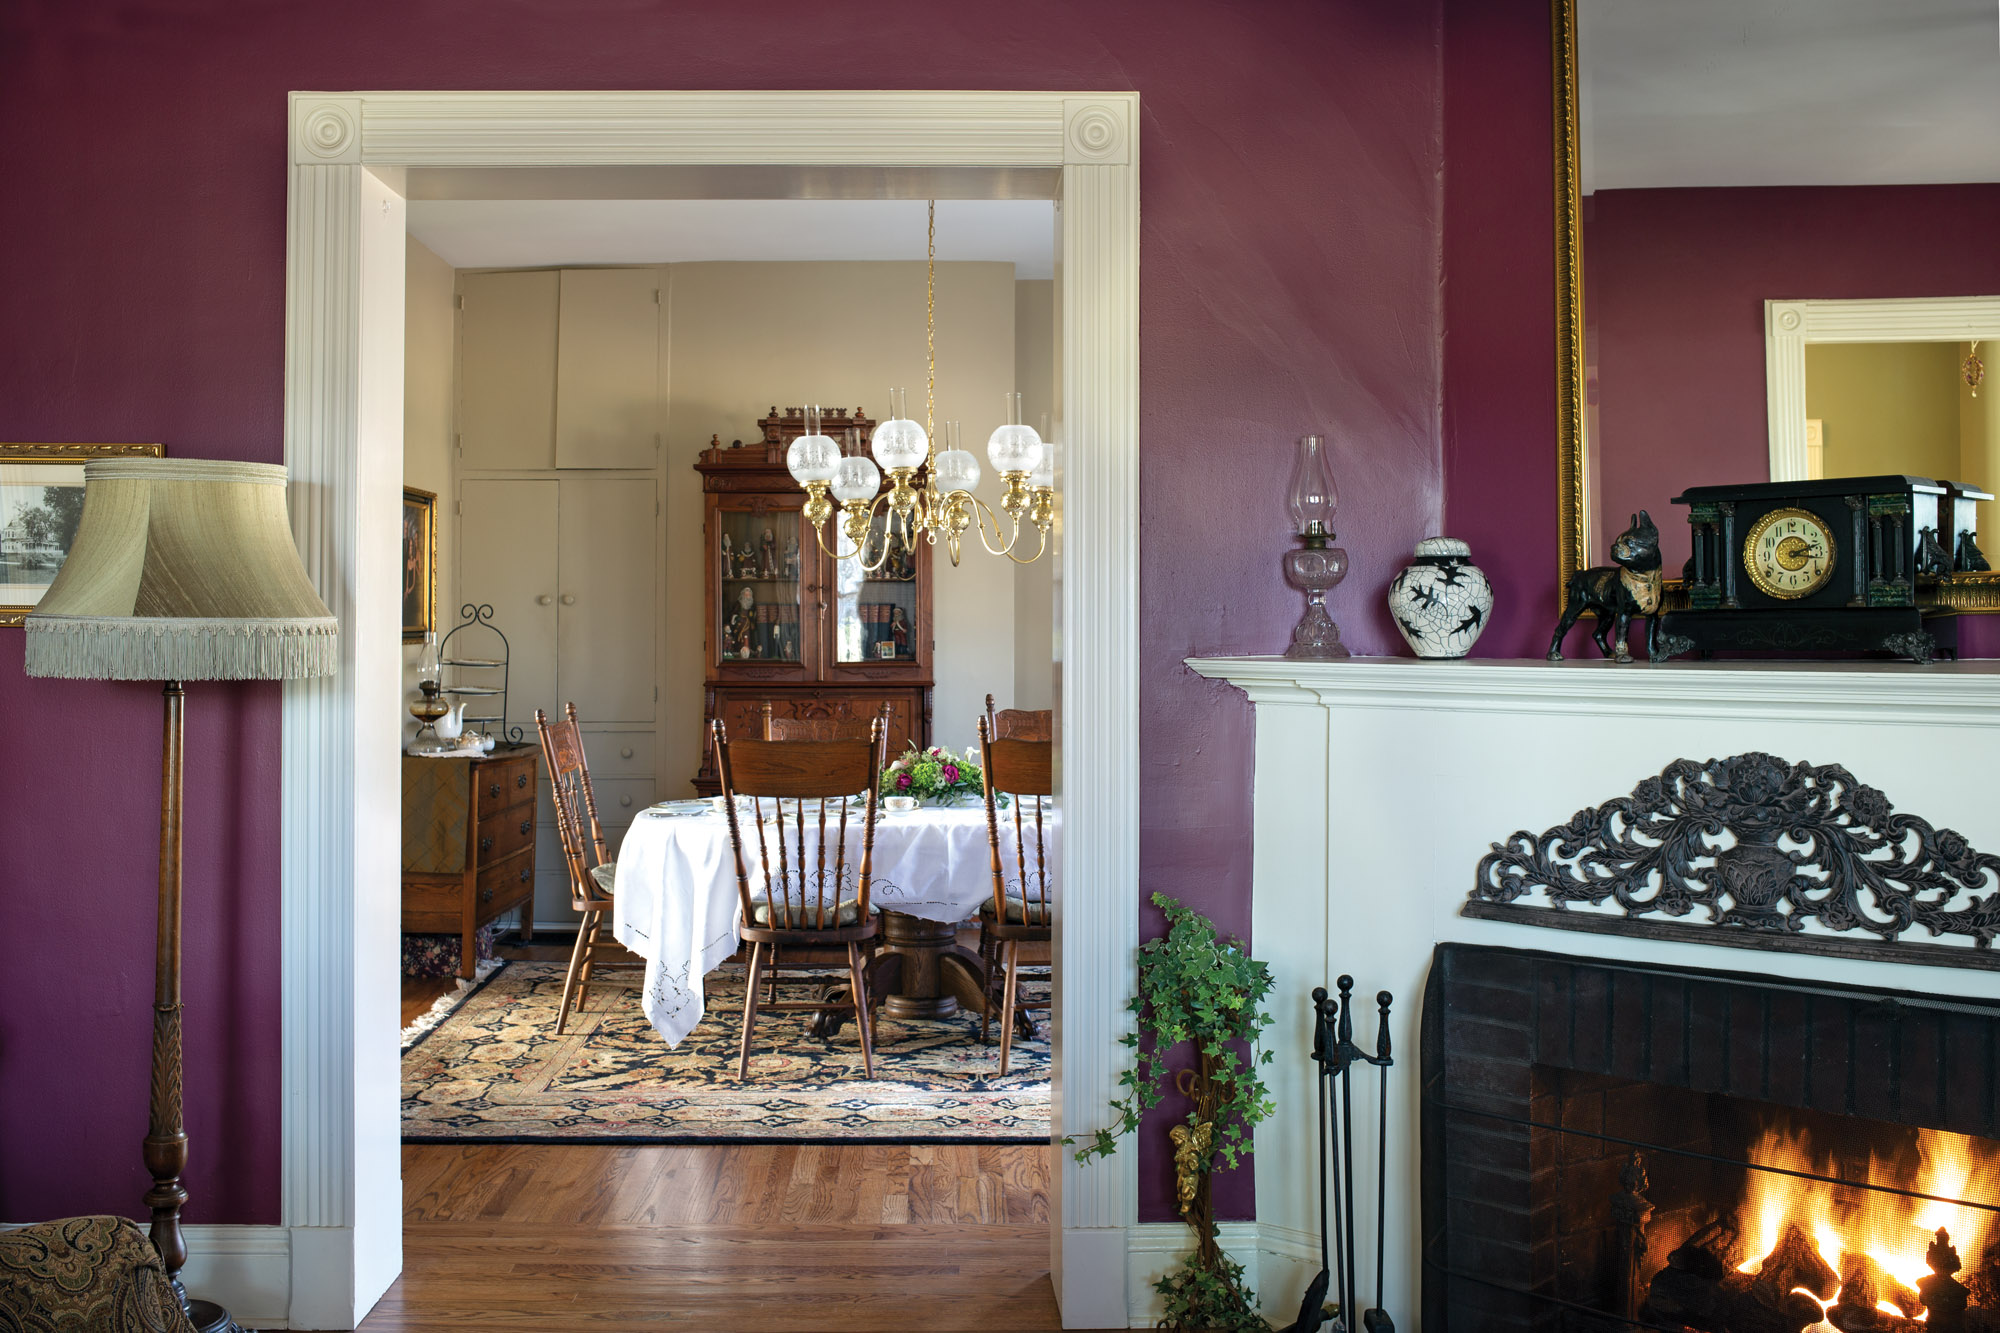 Queen Anne fireplace